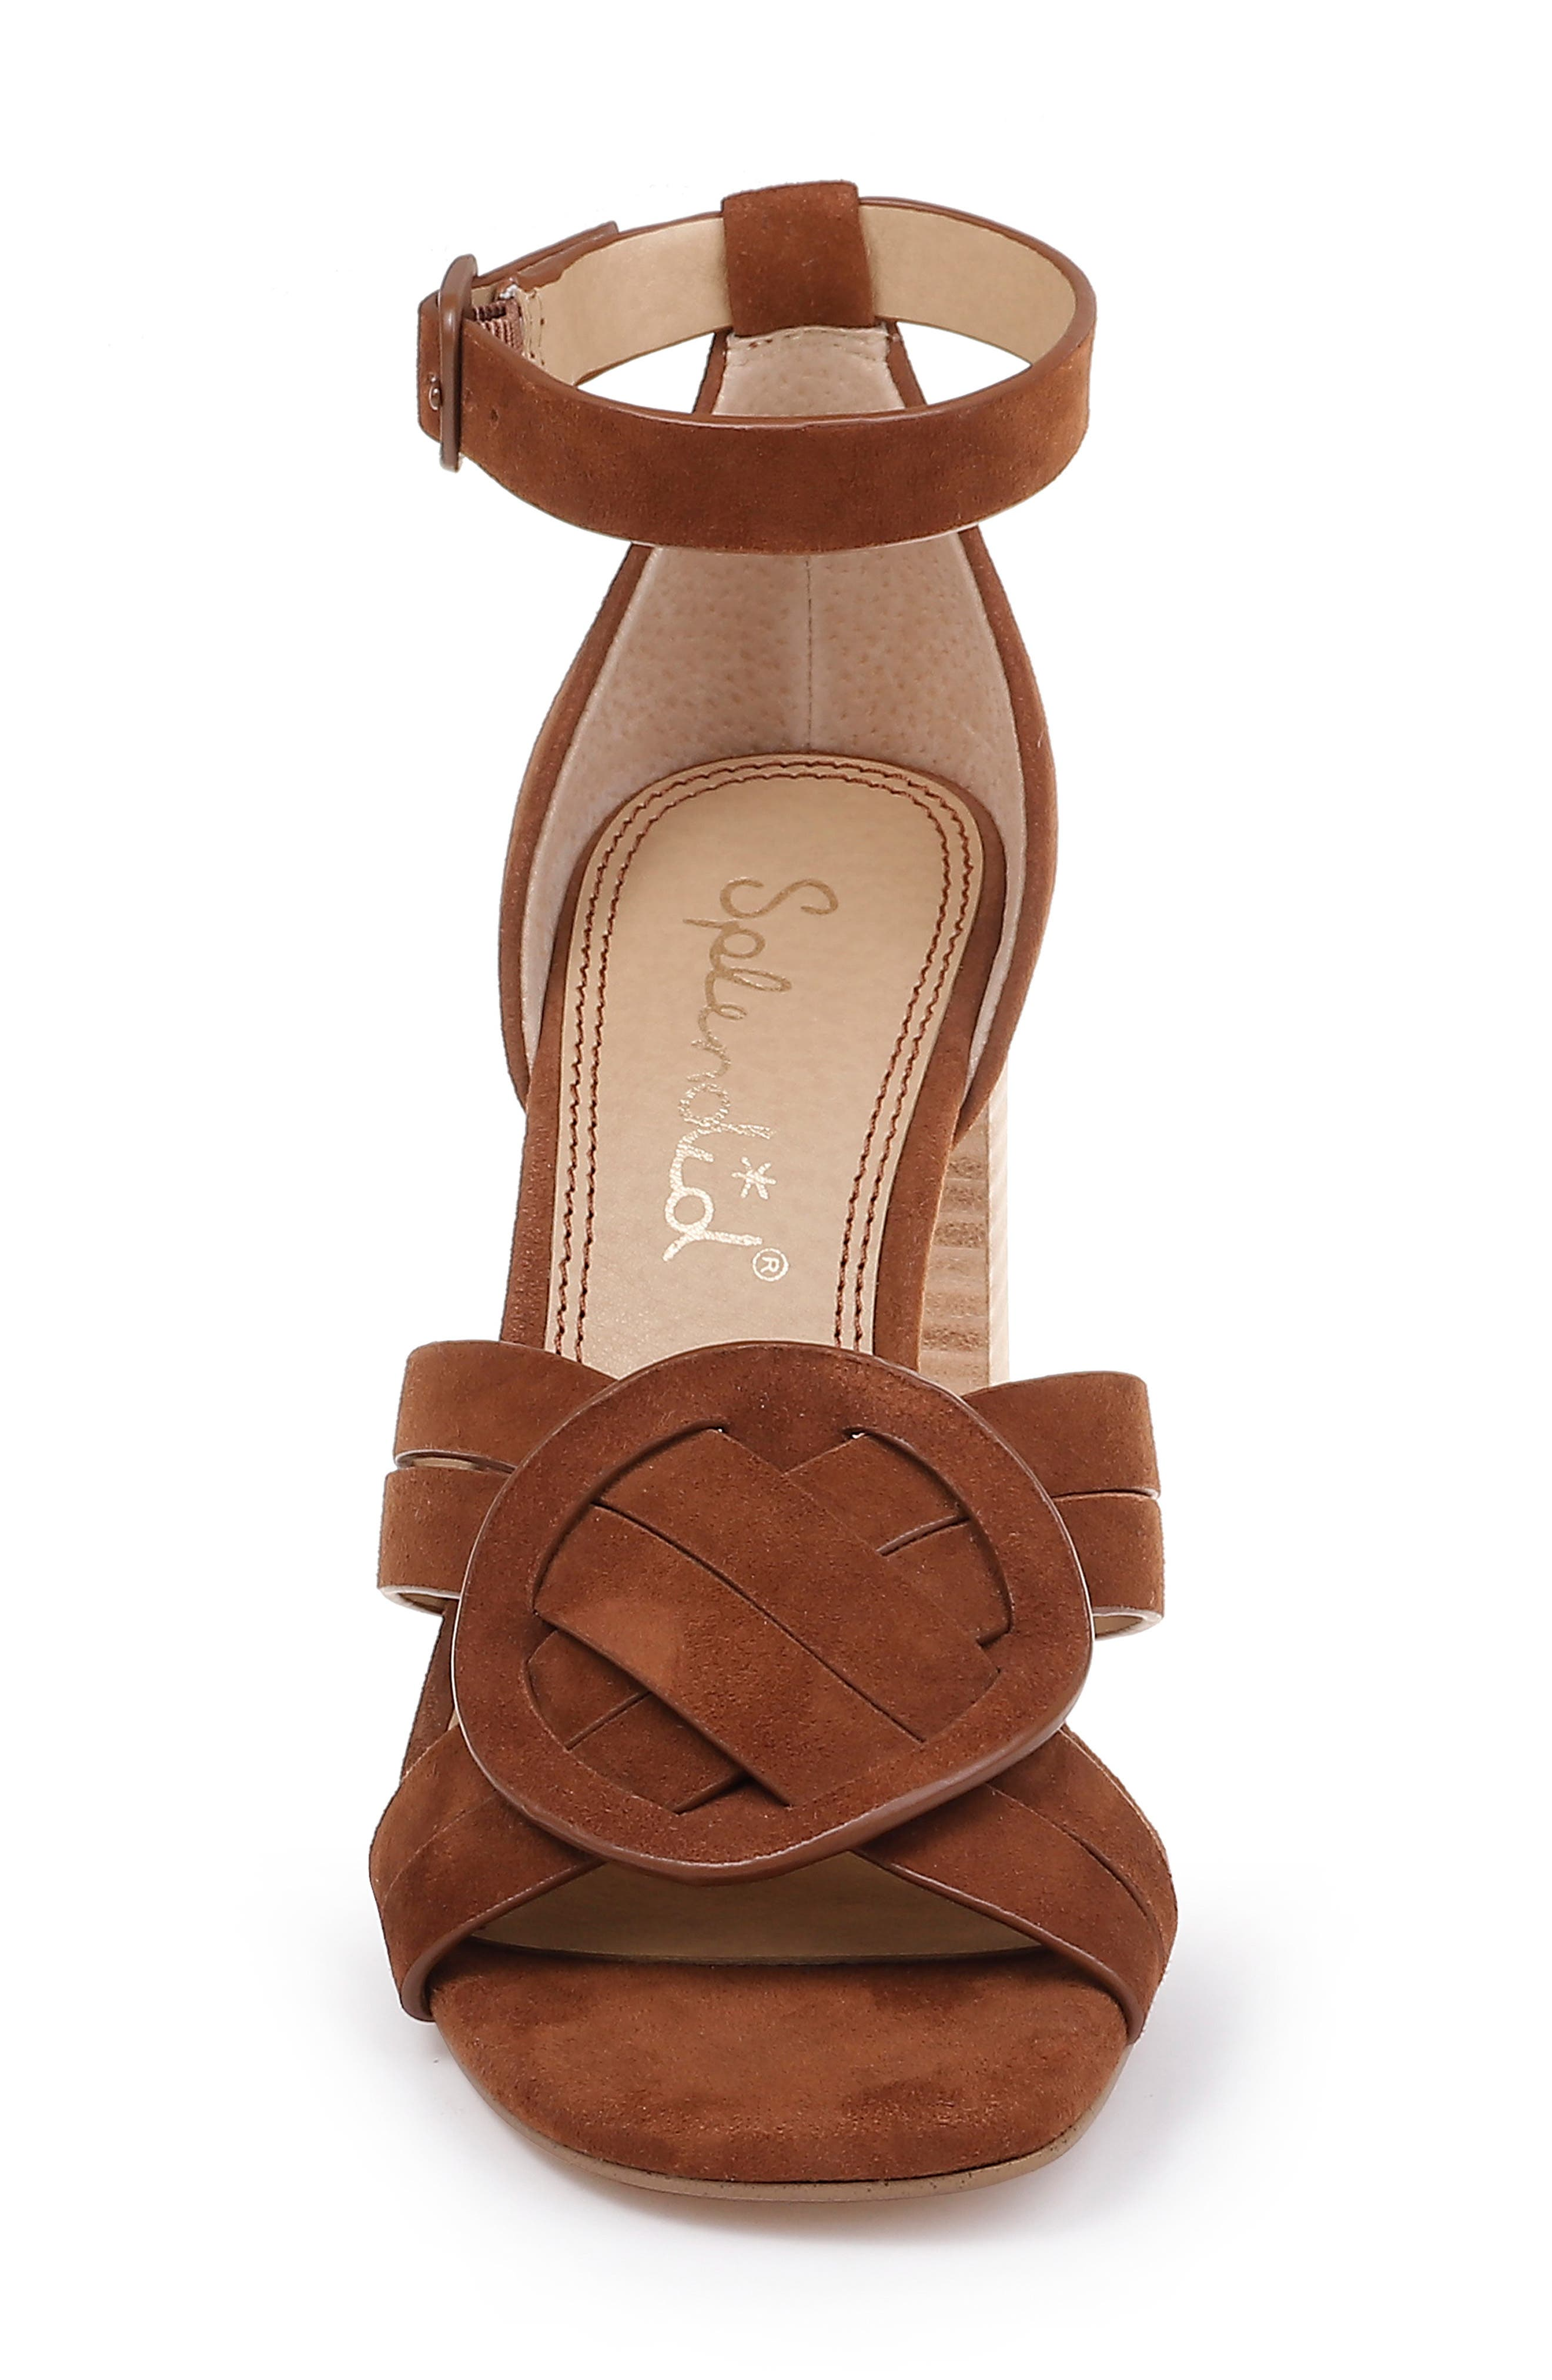 SPLENDID, Tallie Ankle Strap Sandal, Alternate thumbnail 4, color, CHESTNUT SUEDE